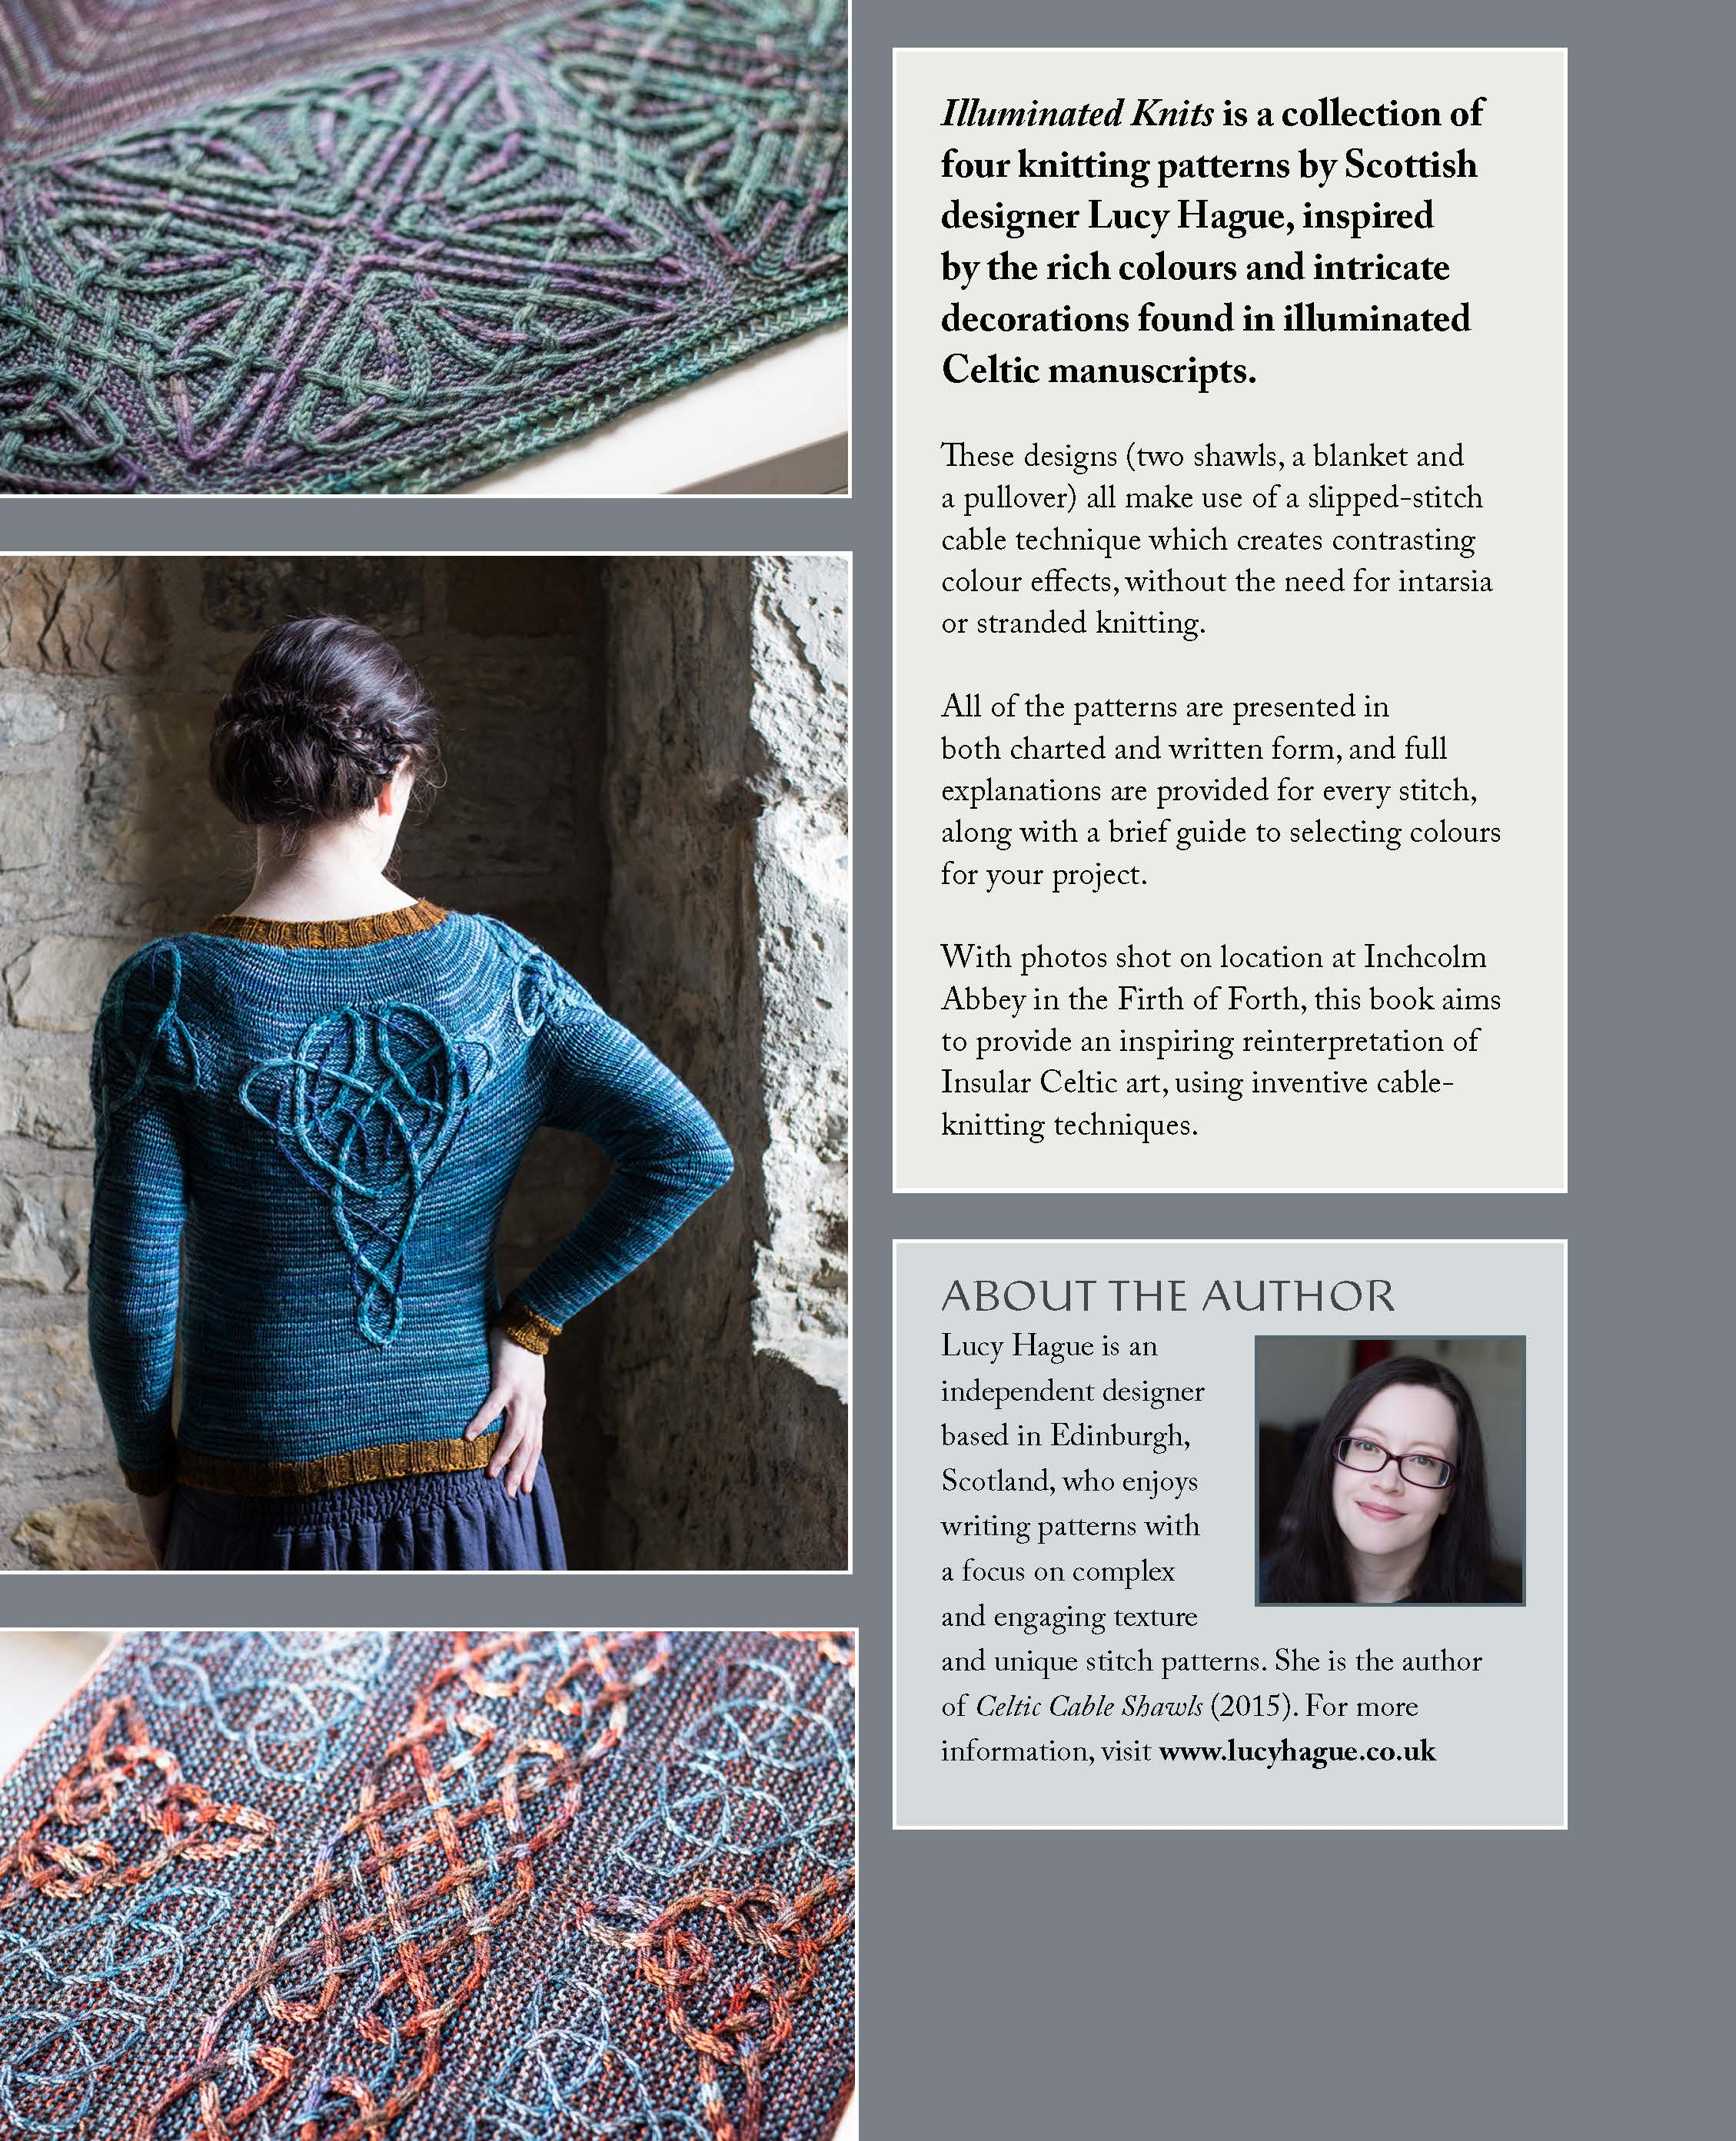 illuminated-knits-v1-0-cover_page_4.jpg